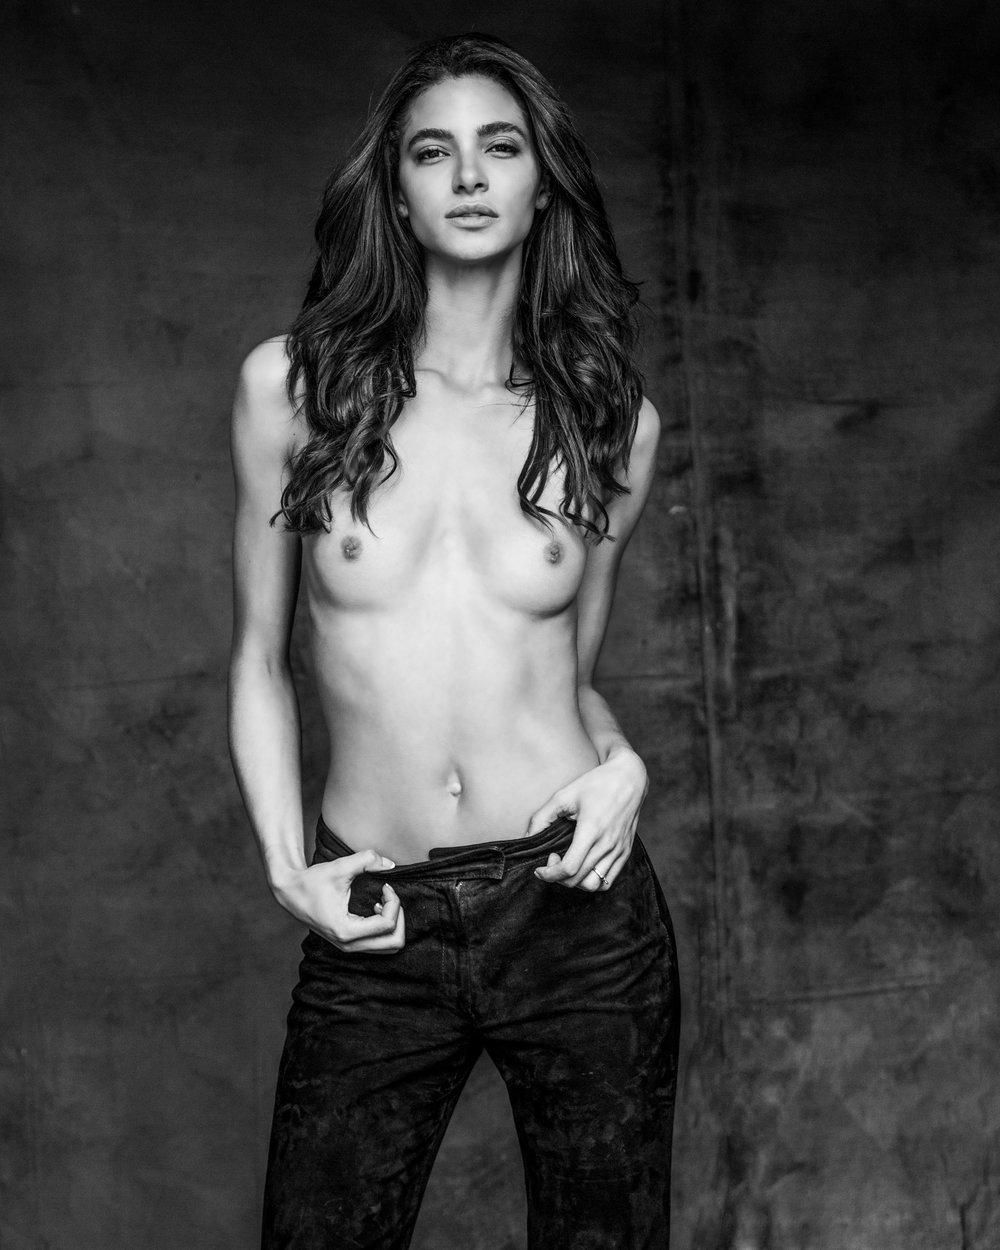 Jordan by Philippe Regard